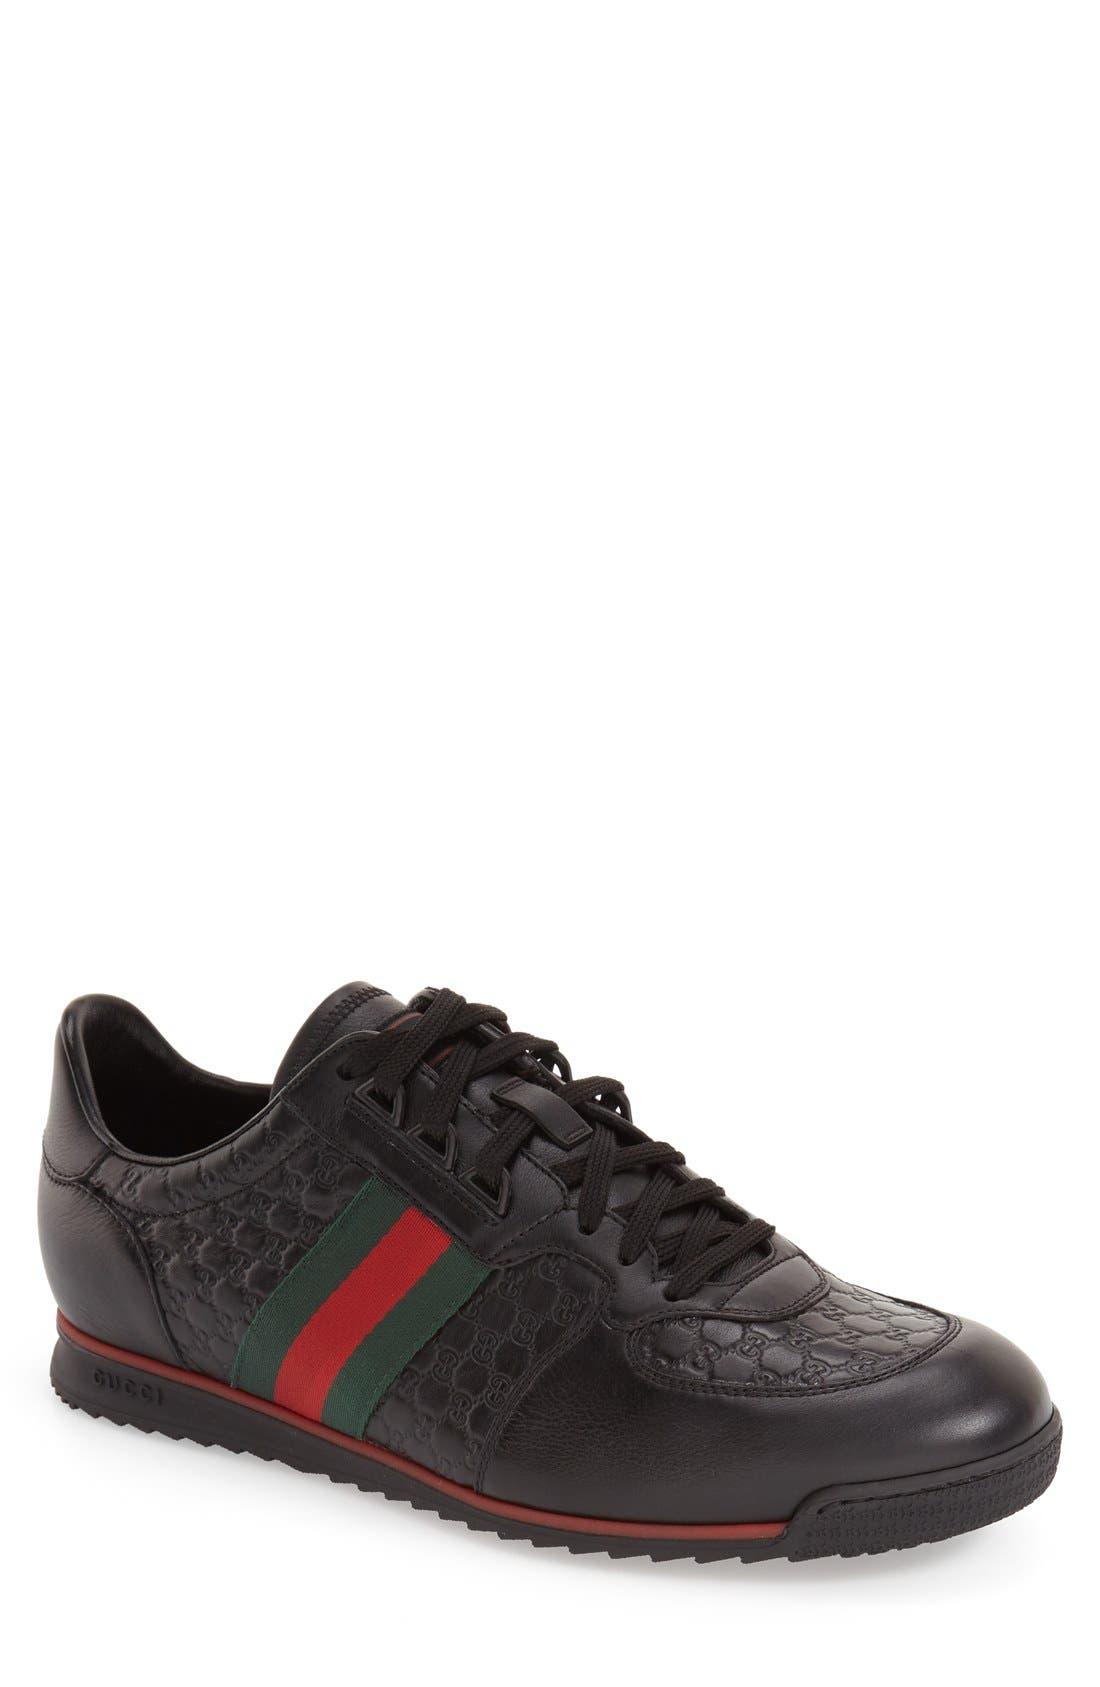 gucci shoes black and white. gucci sl 73 sneaker (men) shoes black and white s